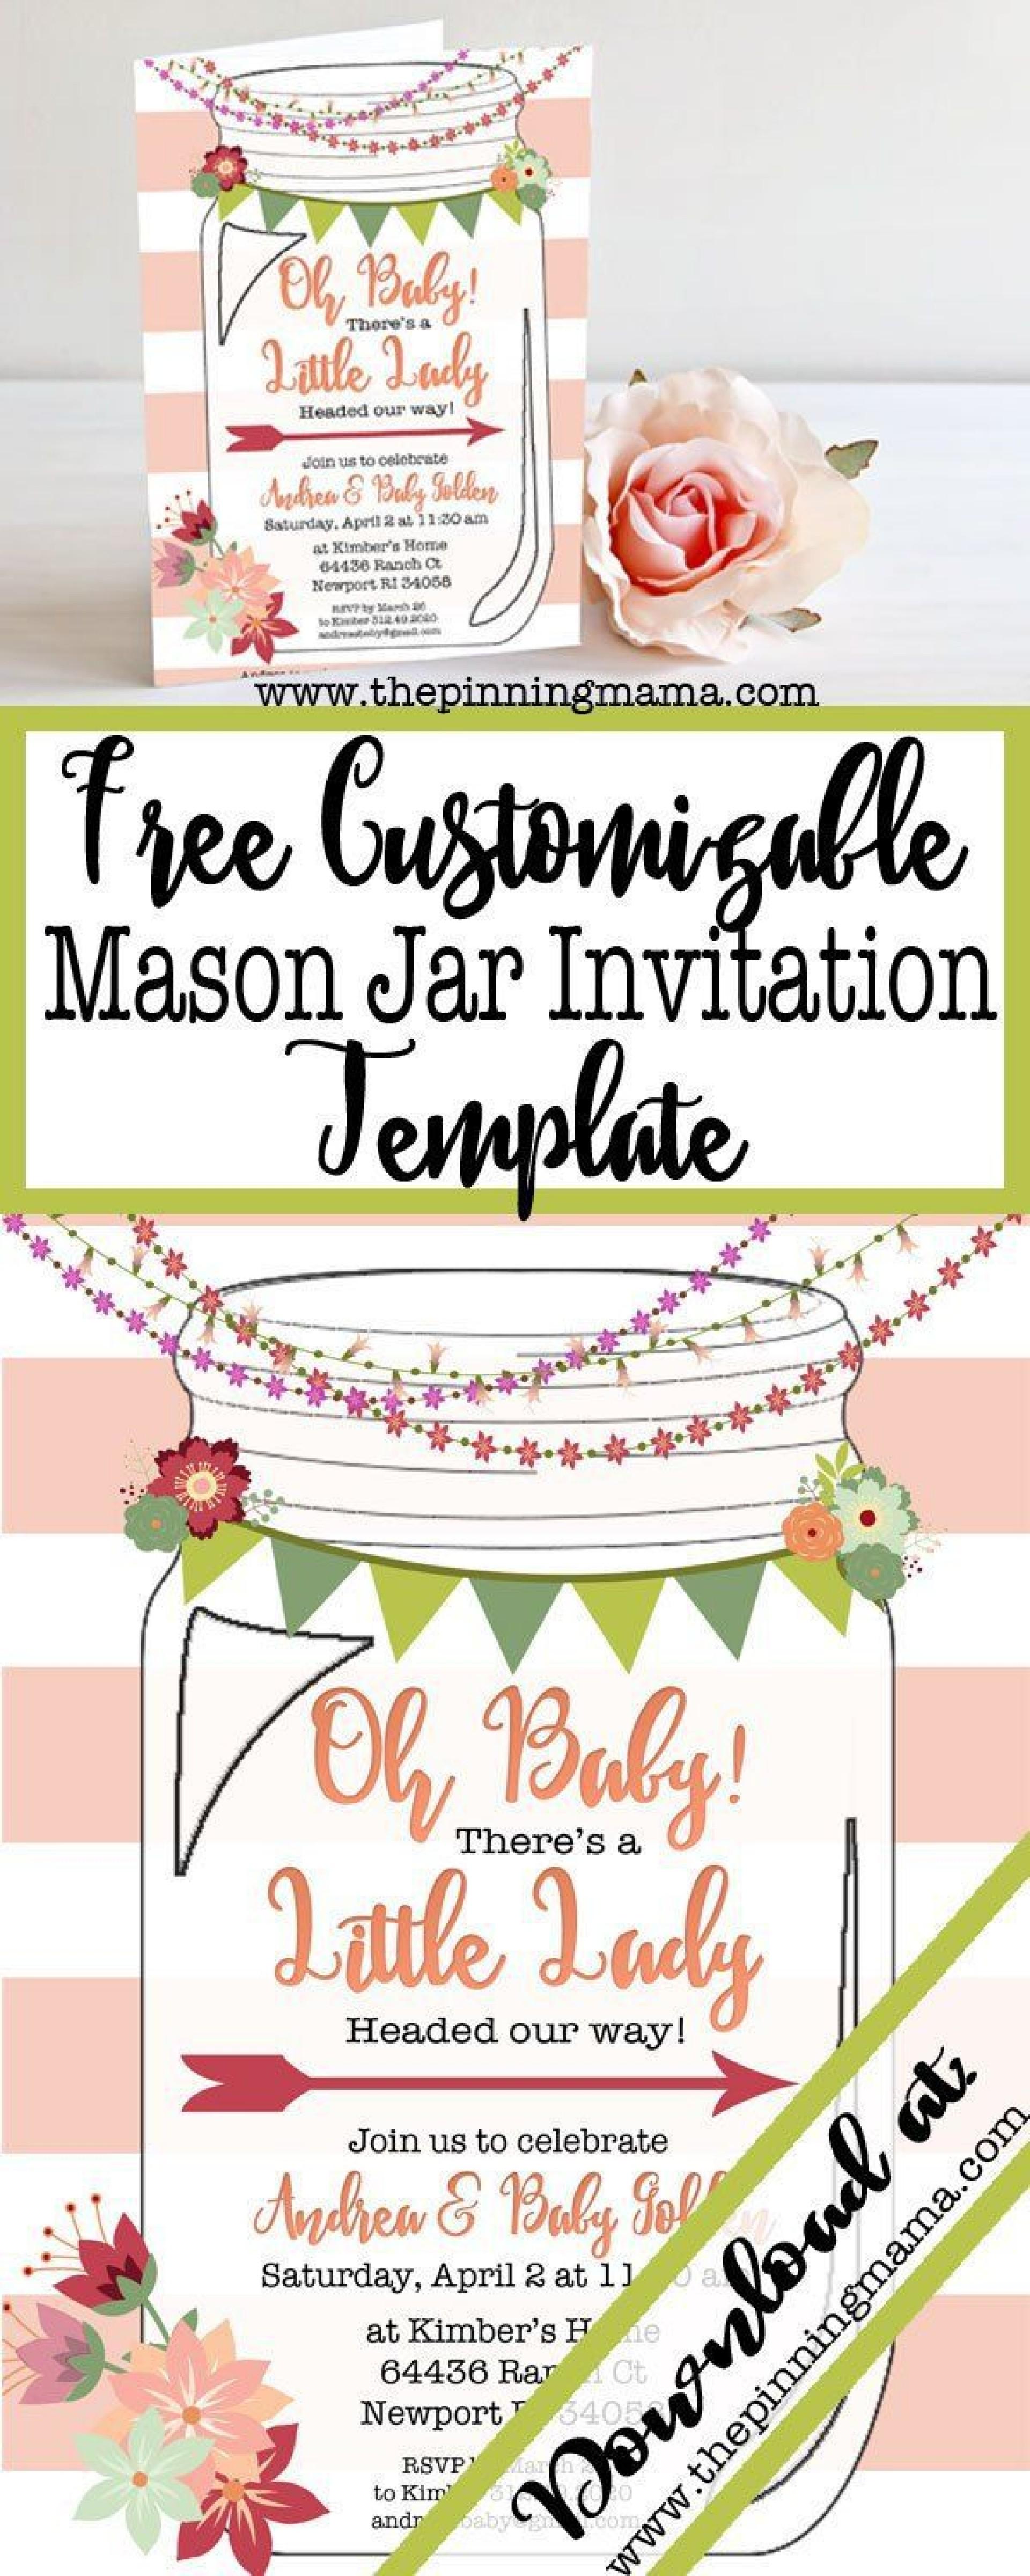 008 Astounding Mason Jar Invitation Template Example  Free Wedding Shower Rustic1920